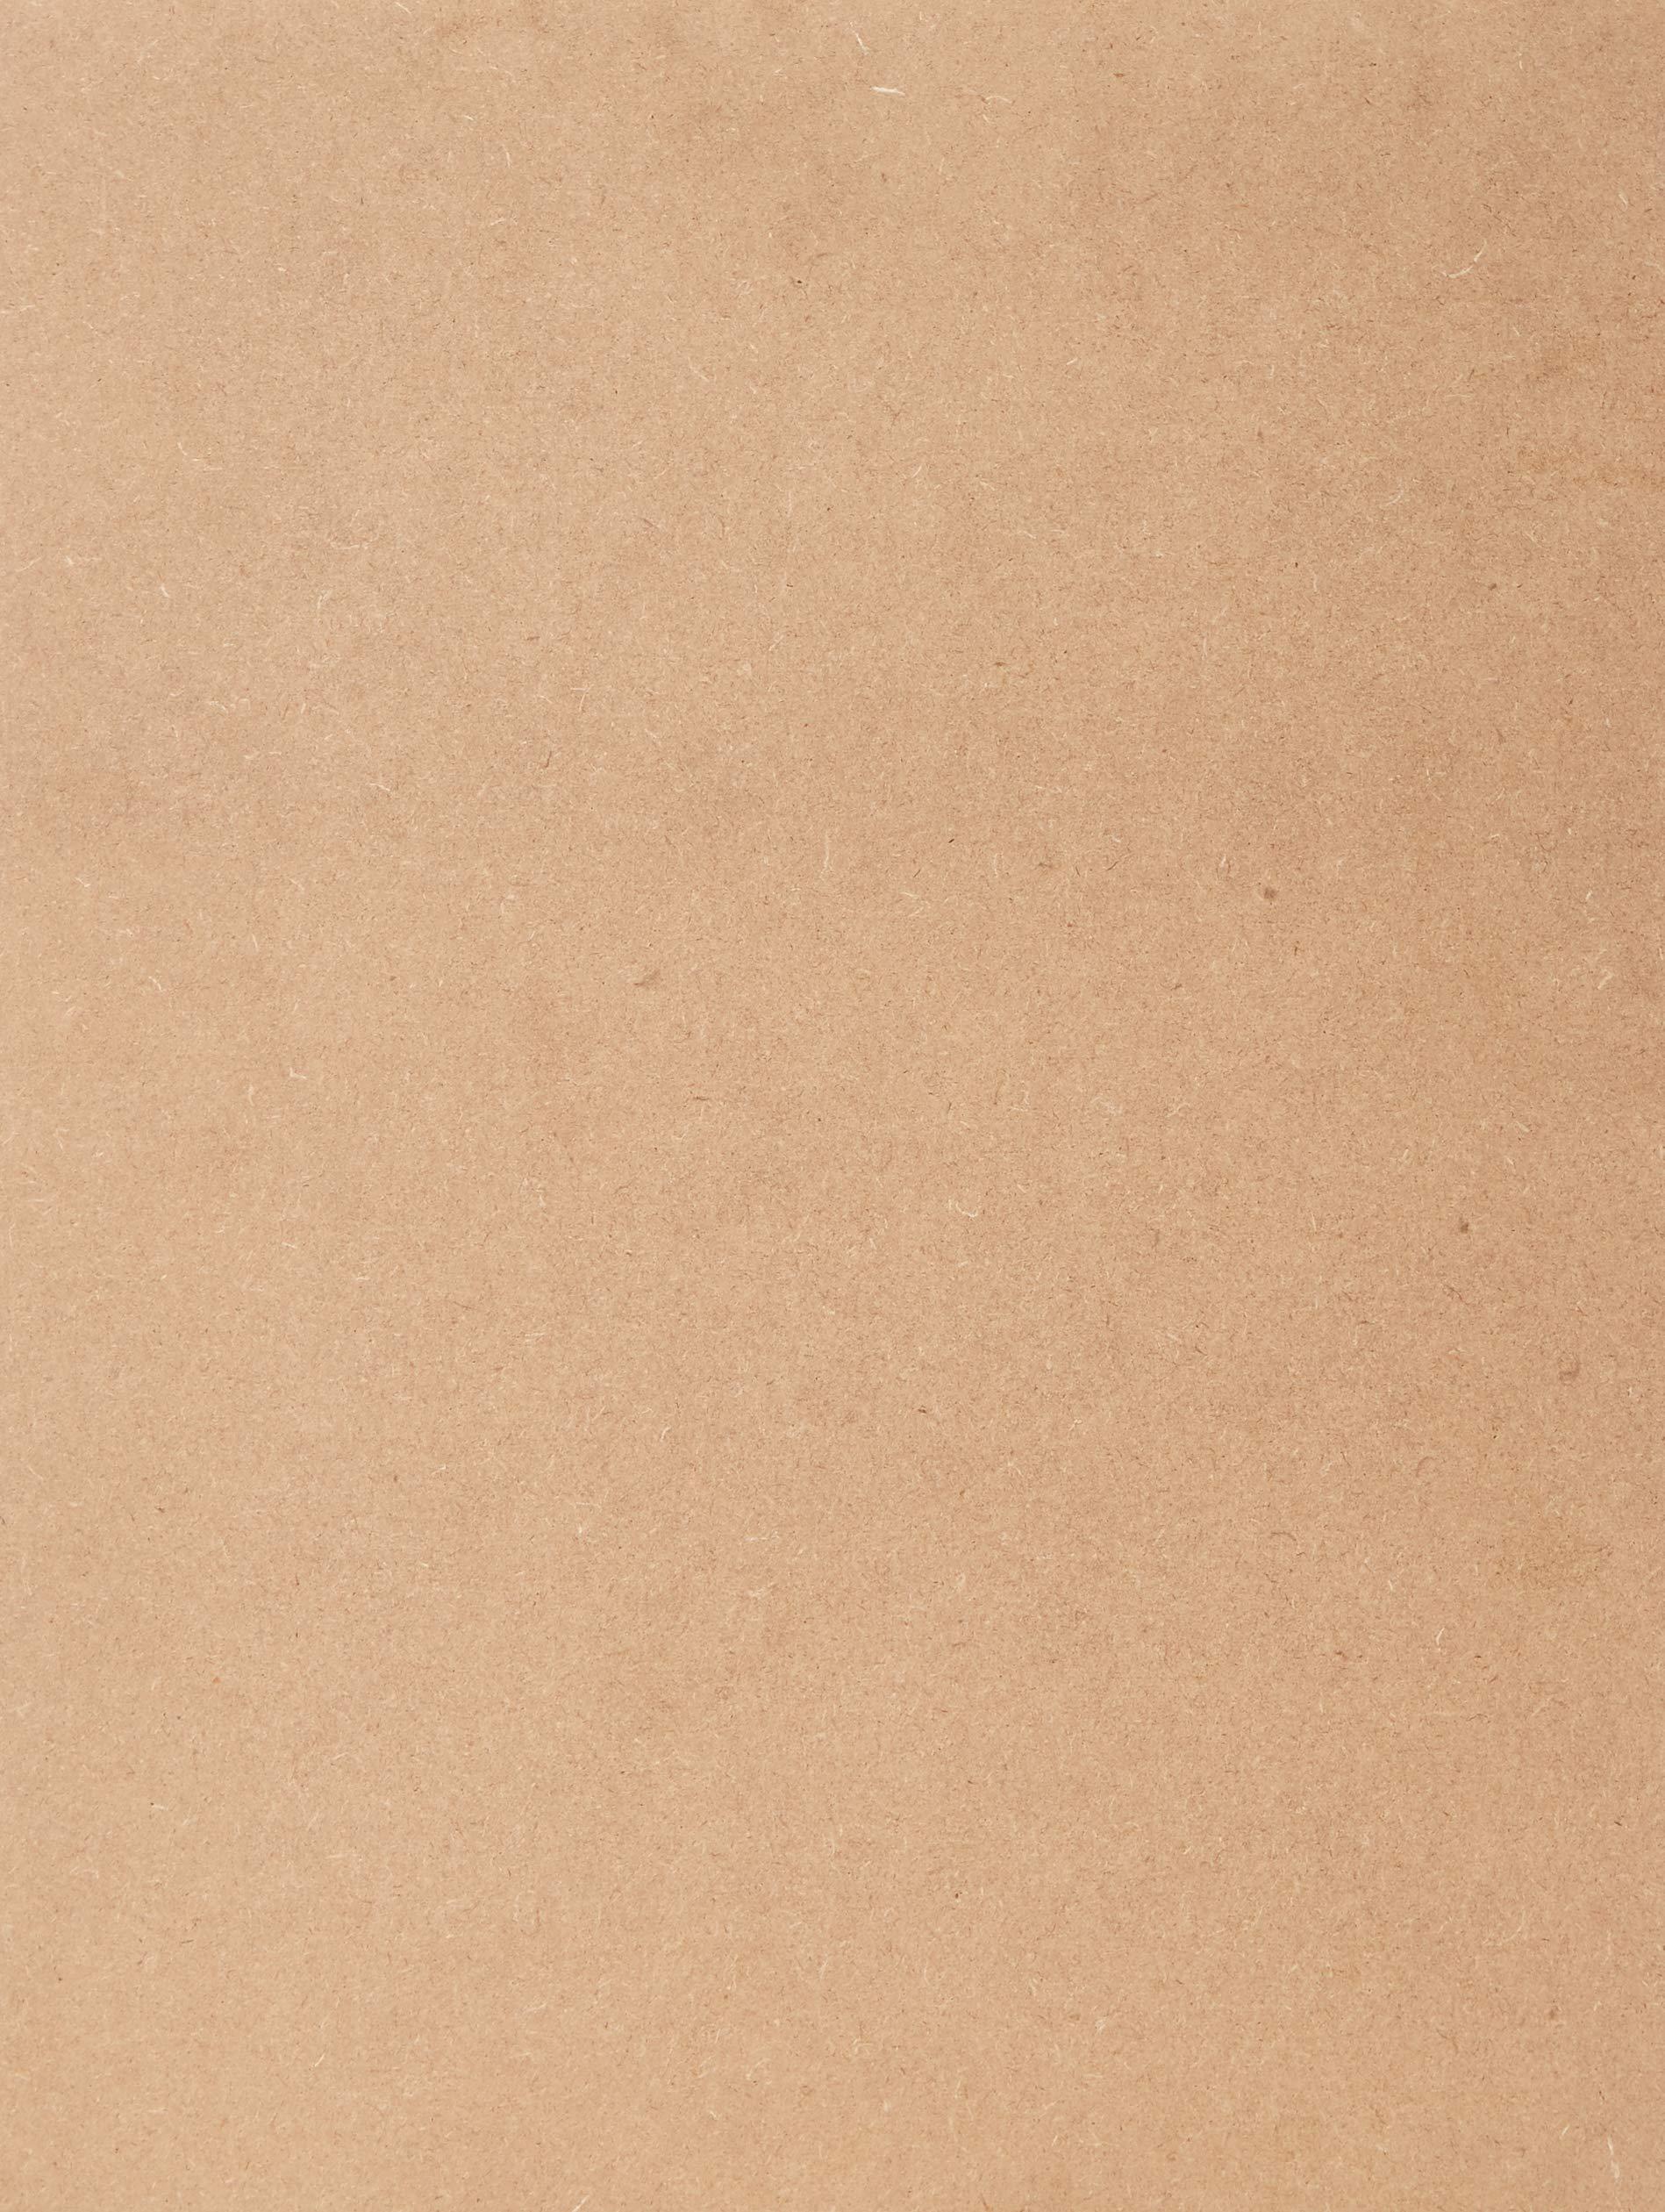 Springer Atlas Hardboard Drawing Board, 18 x 24 x 1/4 Inches - 565567 by Springer Atlas